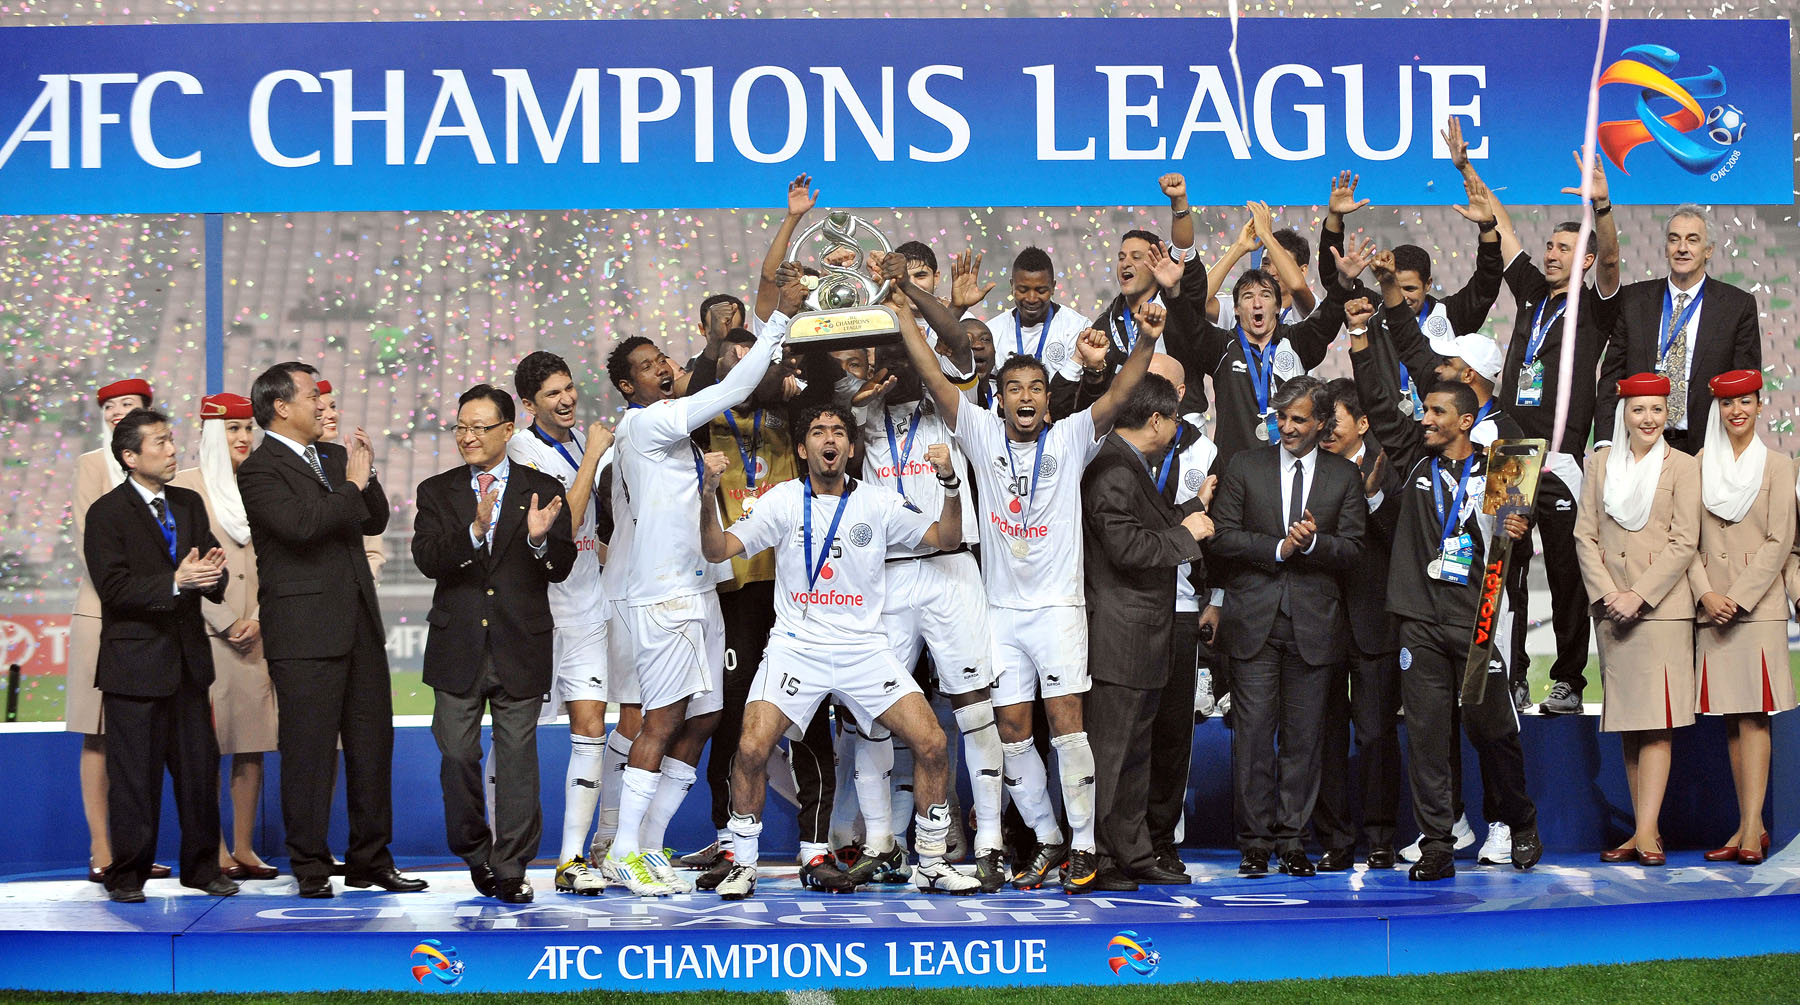 Asian champions league schedule